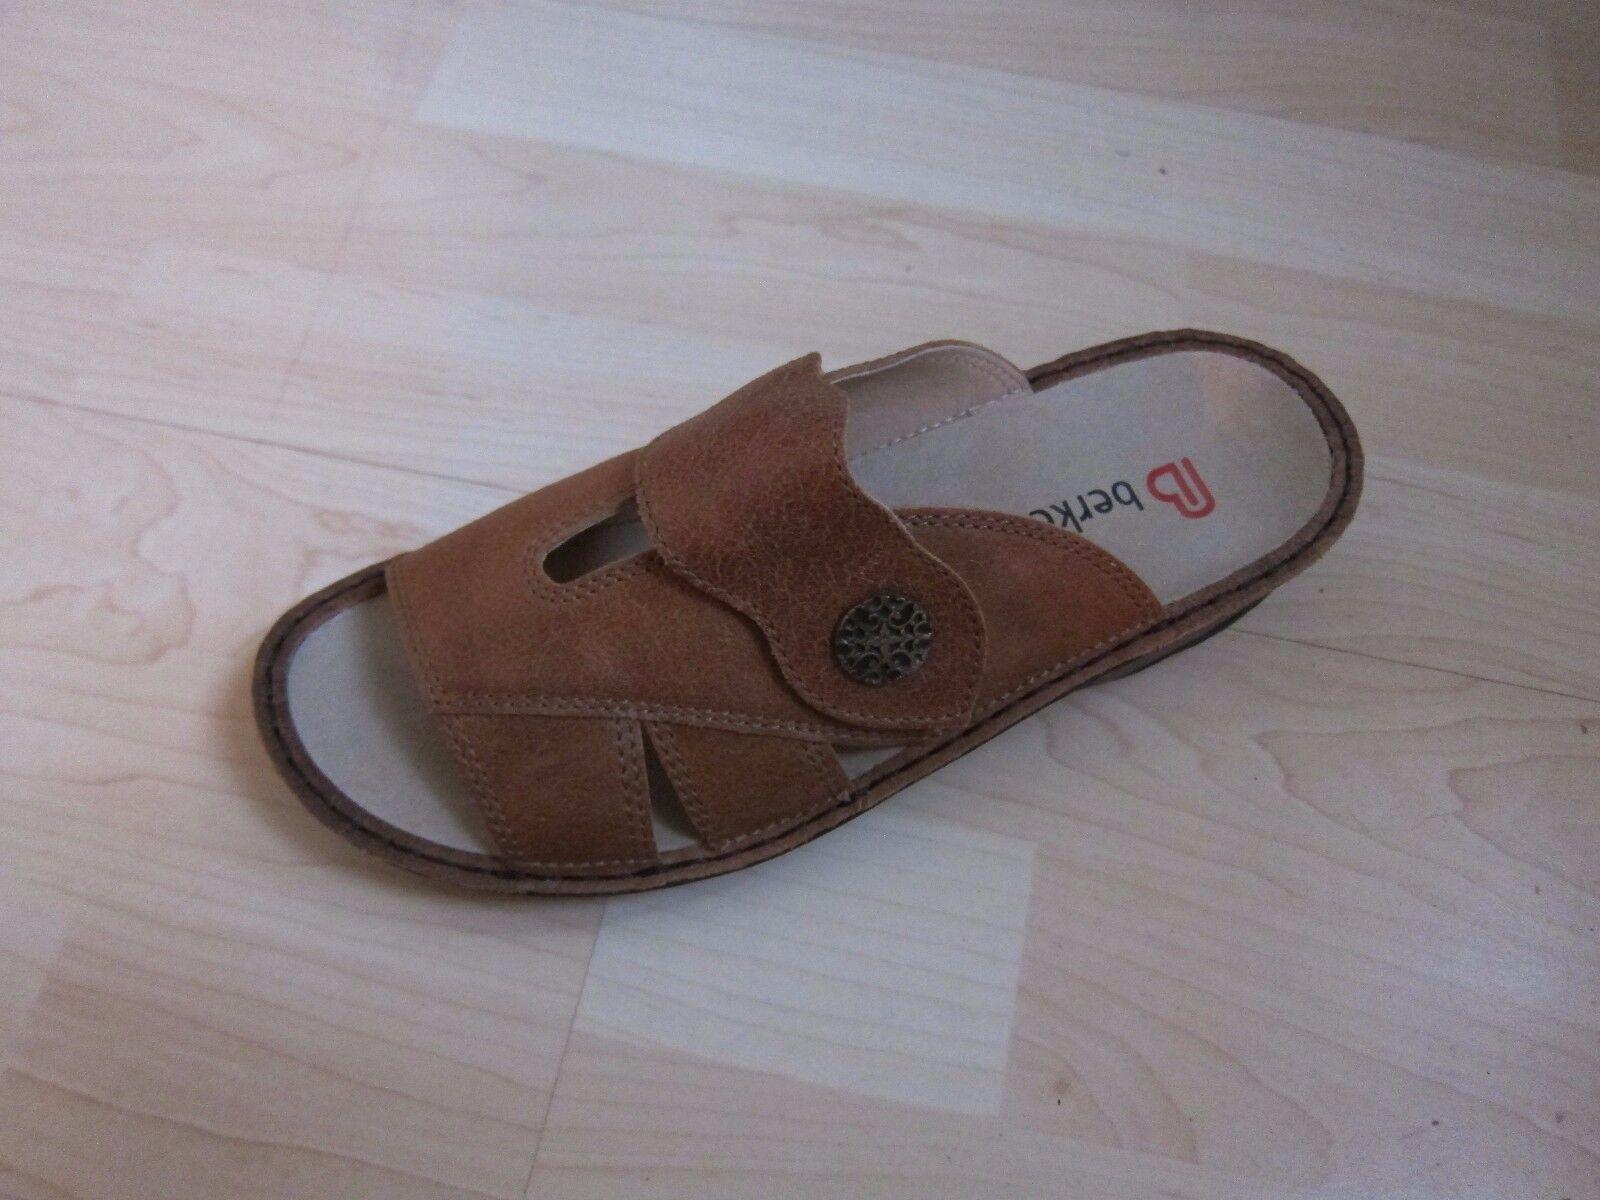 BERKEMANN Damen Gesine  Loses Fußbett Gr. 37,5  Gesine (4,5) #1687# 5ff874